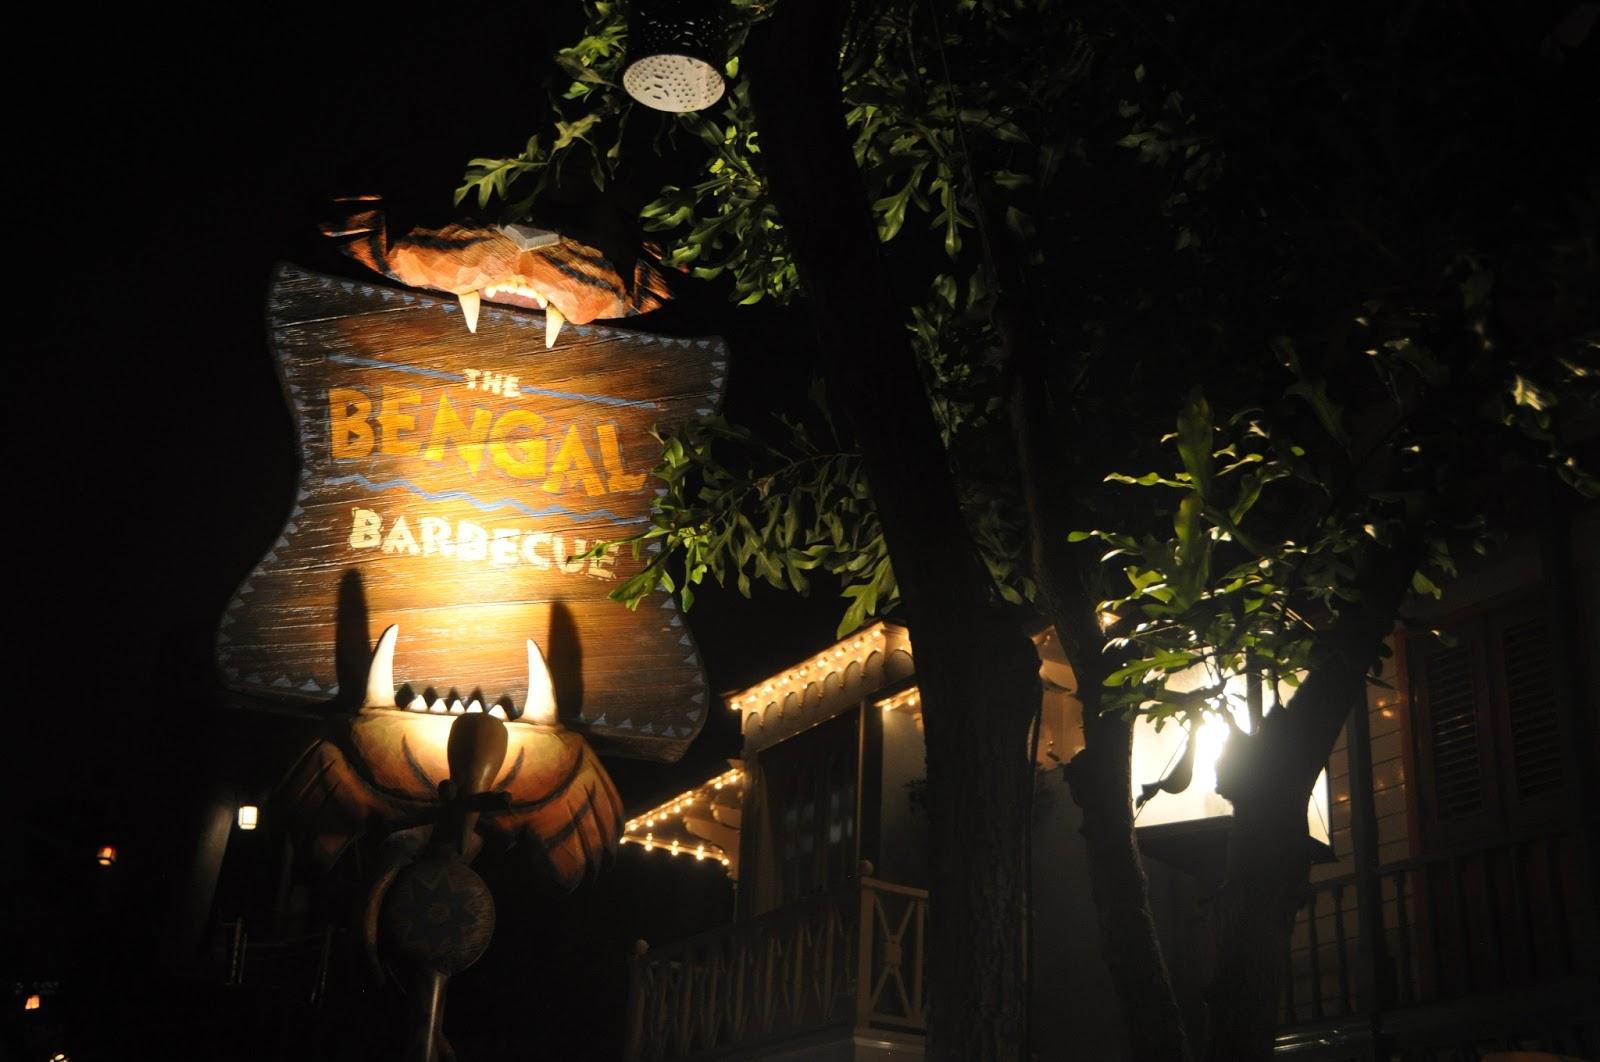 Disney, Disneyland, Disney fan, Disney lover, magical kingdom, what to do at Disneyland, Disney fashion, California adventure, California advenure food, whre to eat at California adventure, Disney apparel, Disney food, Disney food review, mickey mouse ears, where to eat at Disneyland, fashion blog, fashion blogger, style blog, style blogger, mens fashion, mens fashion blog, mens style, mens style blog, womens style blog, anthropologie ootd blog, anthropologie ootd, anthropologie, ootd, mens ootd, womens ootd,